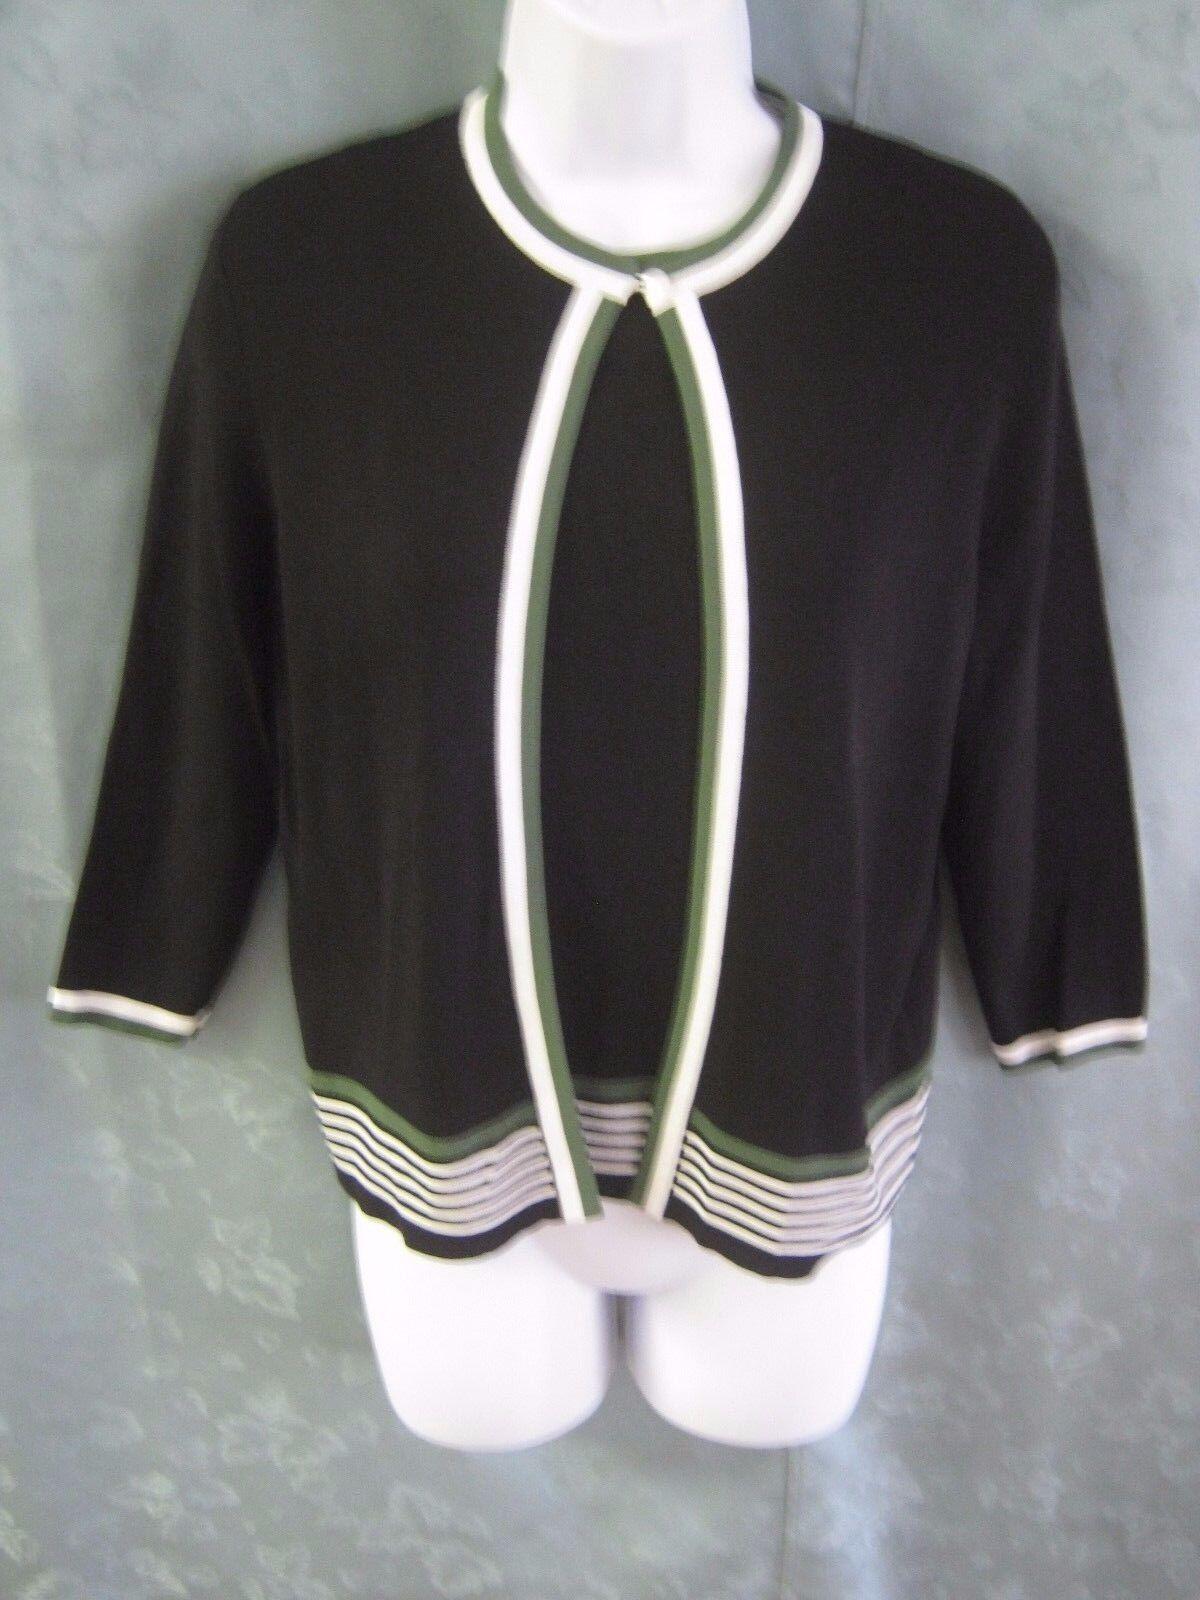 4b276ed2b55 Dressbarn Sweater Twin Set Size Small Sleeveless Flat Knit Top   Cardigan